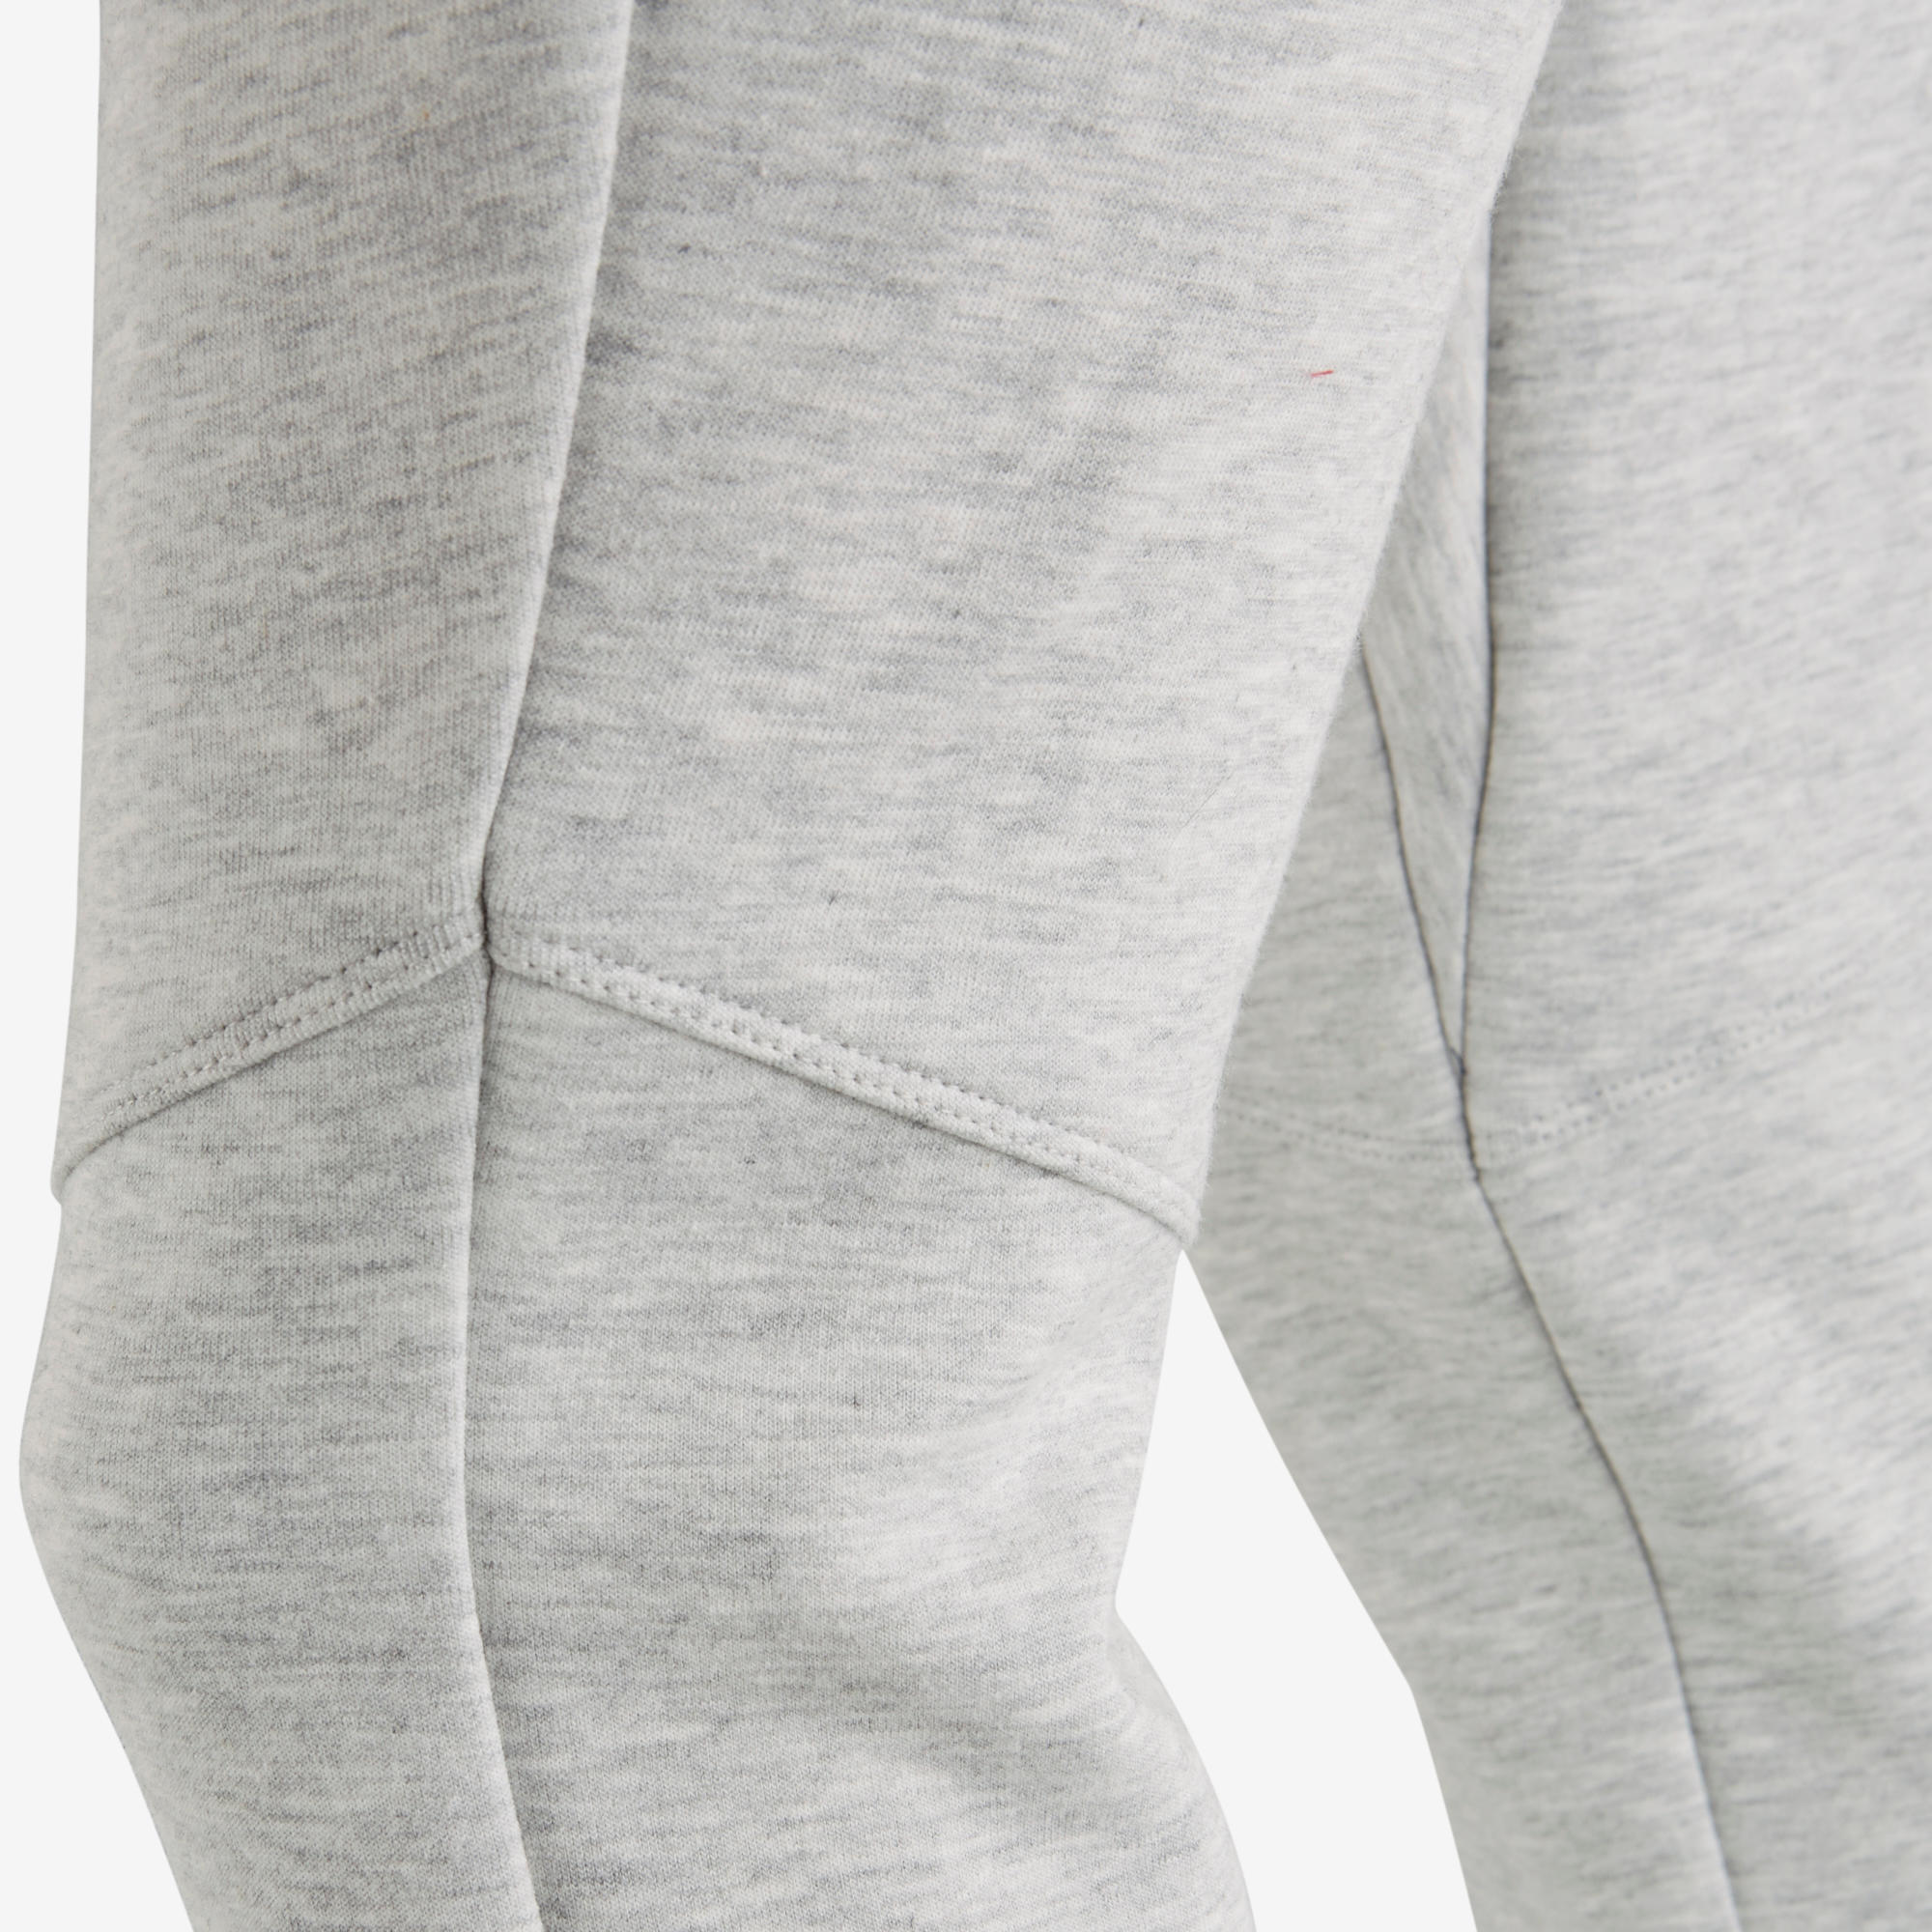 500 Spacer Girls' Gym Bottoms - Light Grey